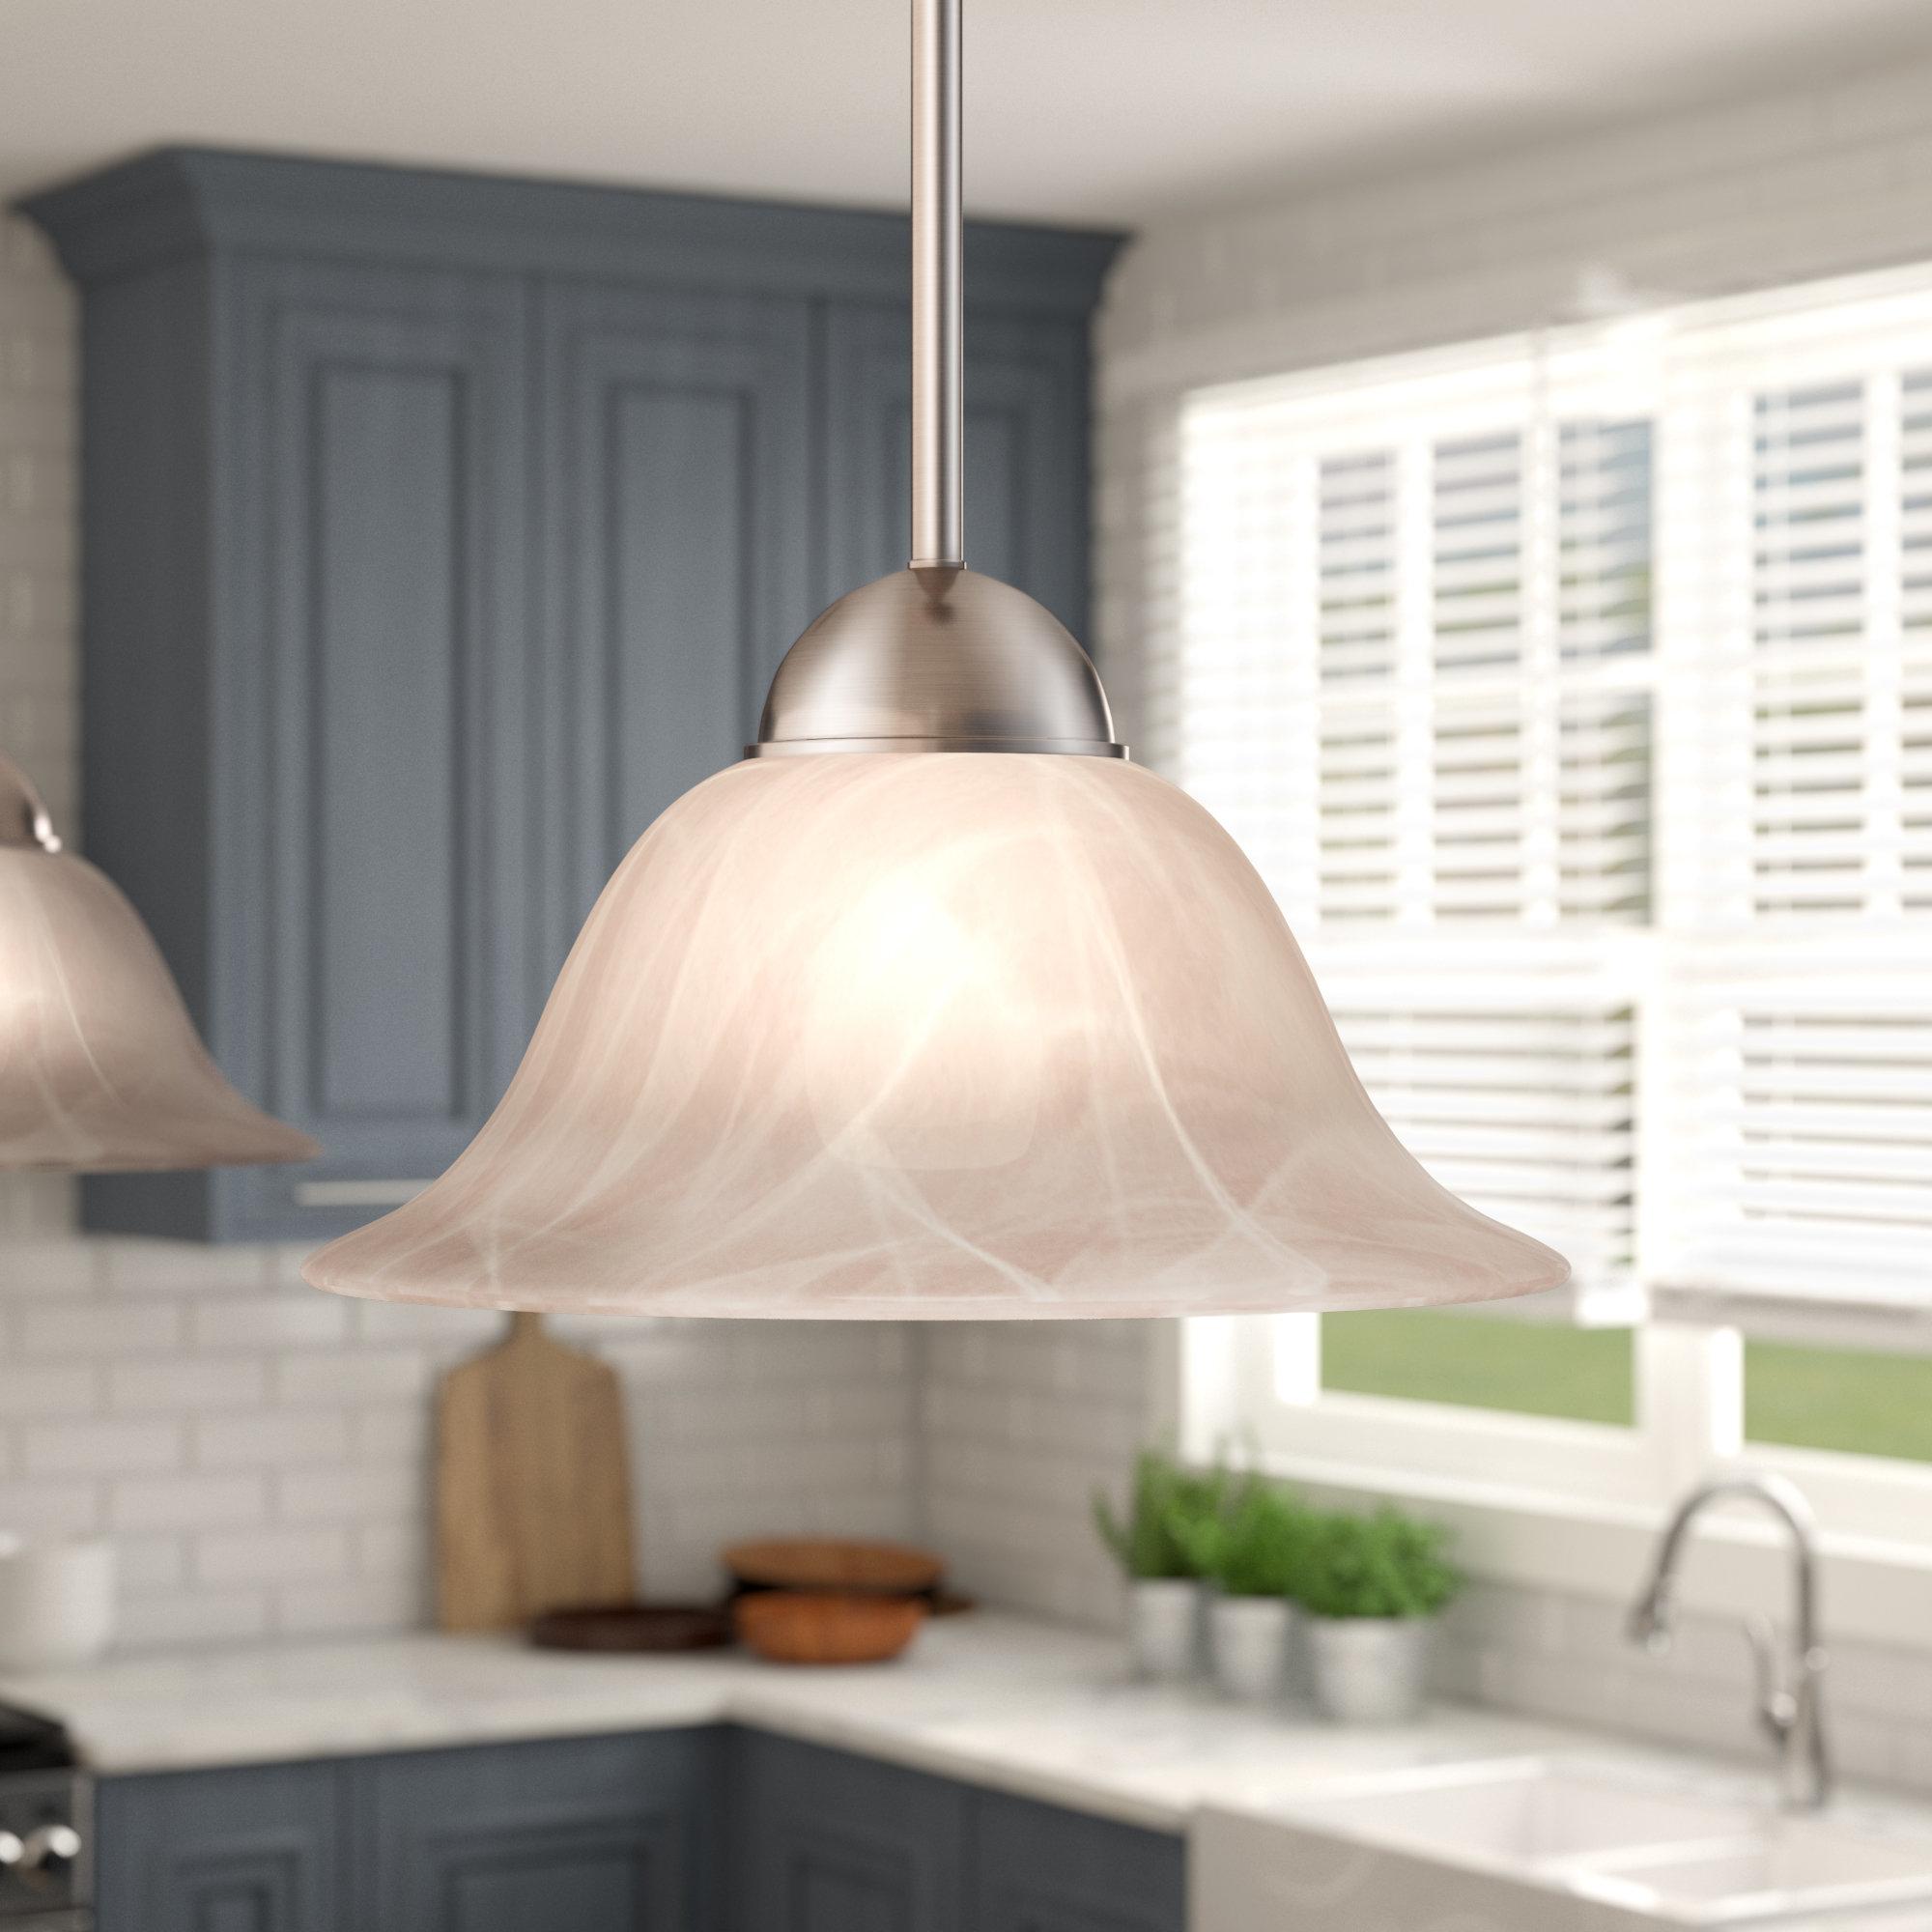 Van Nest 1-Light Single Bell Pendant throughout Trendy Van Horne 3-Light Single Teardrop Pendants